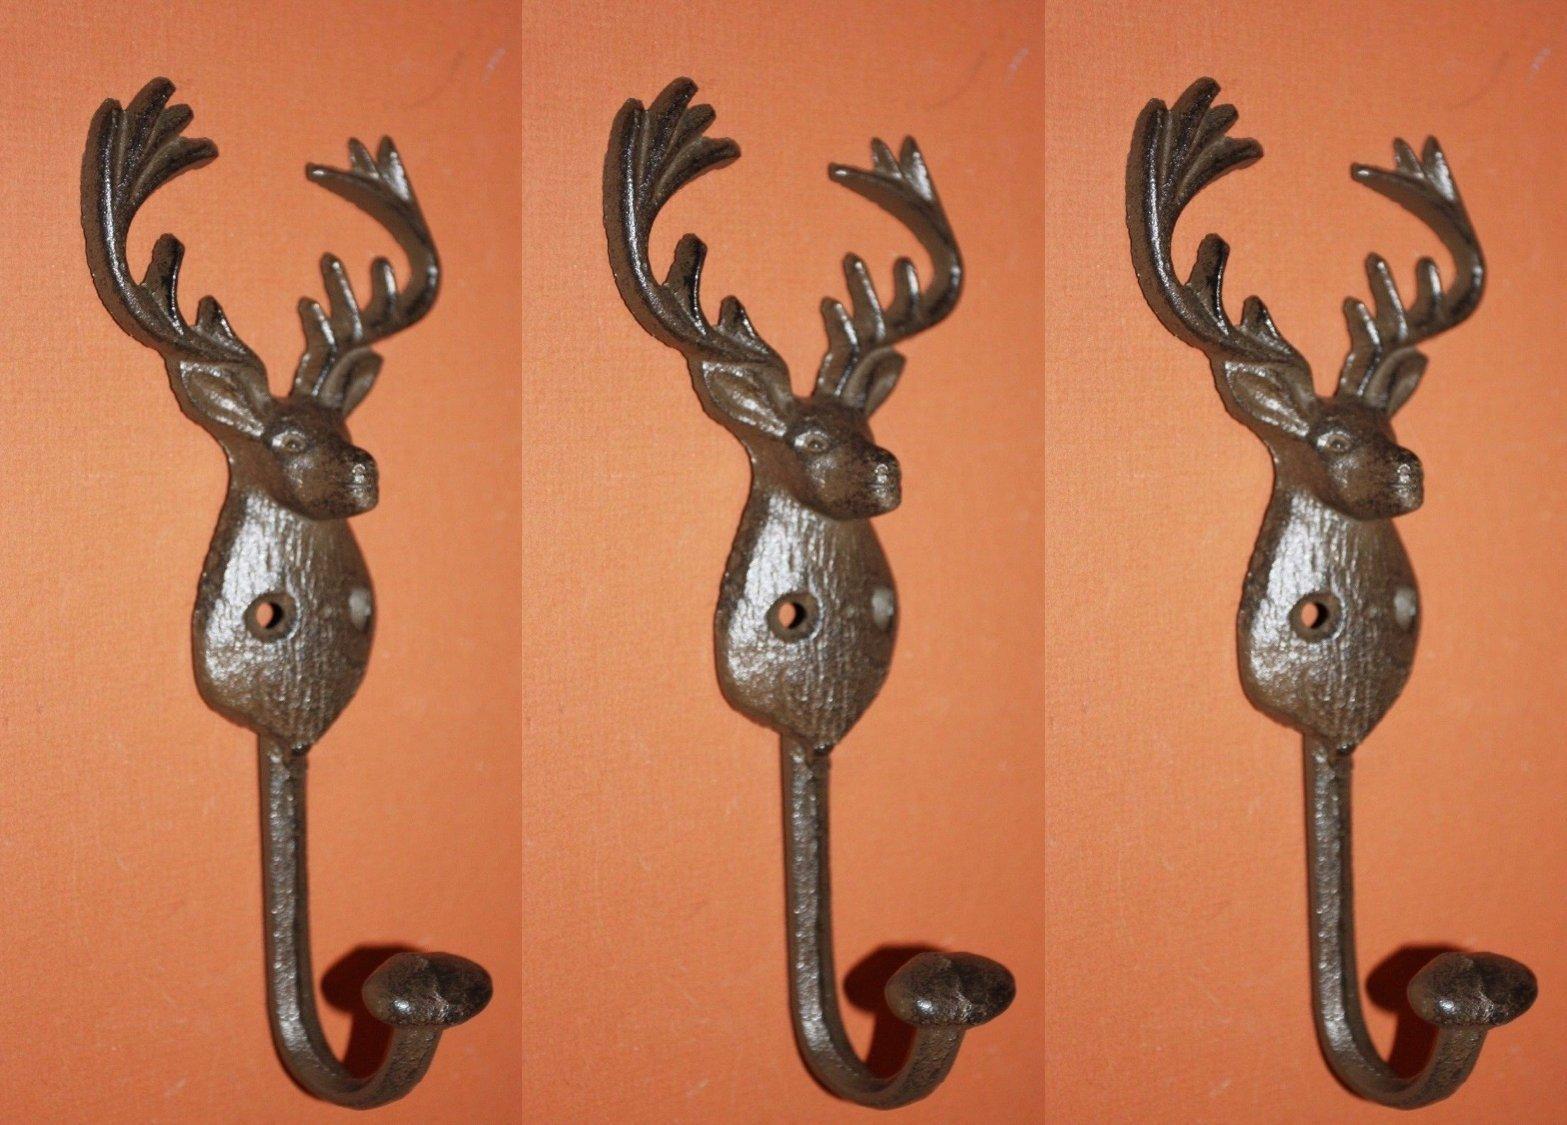 Deer Hunter Theme Bath Decor, Deer Head Bath Towel Hooks Set of 3